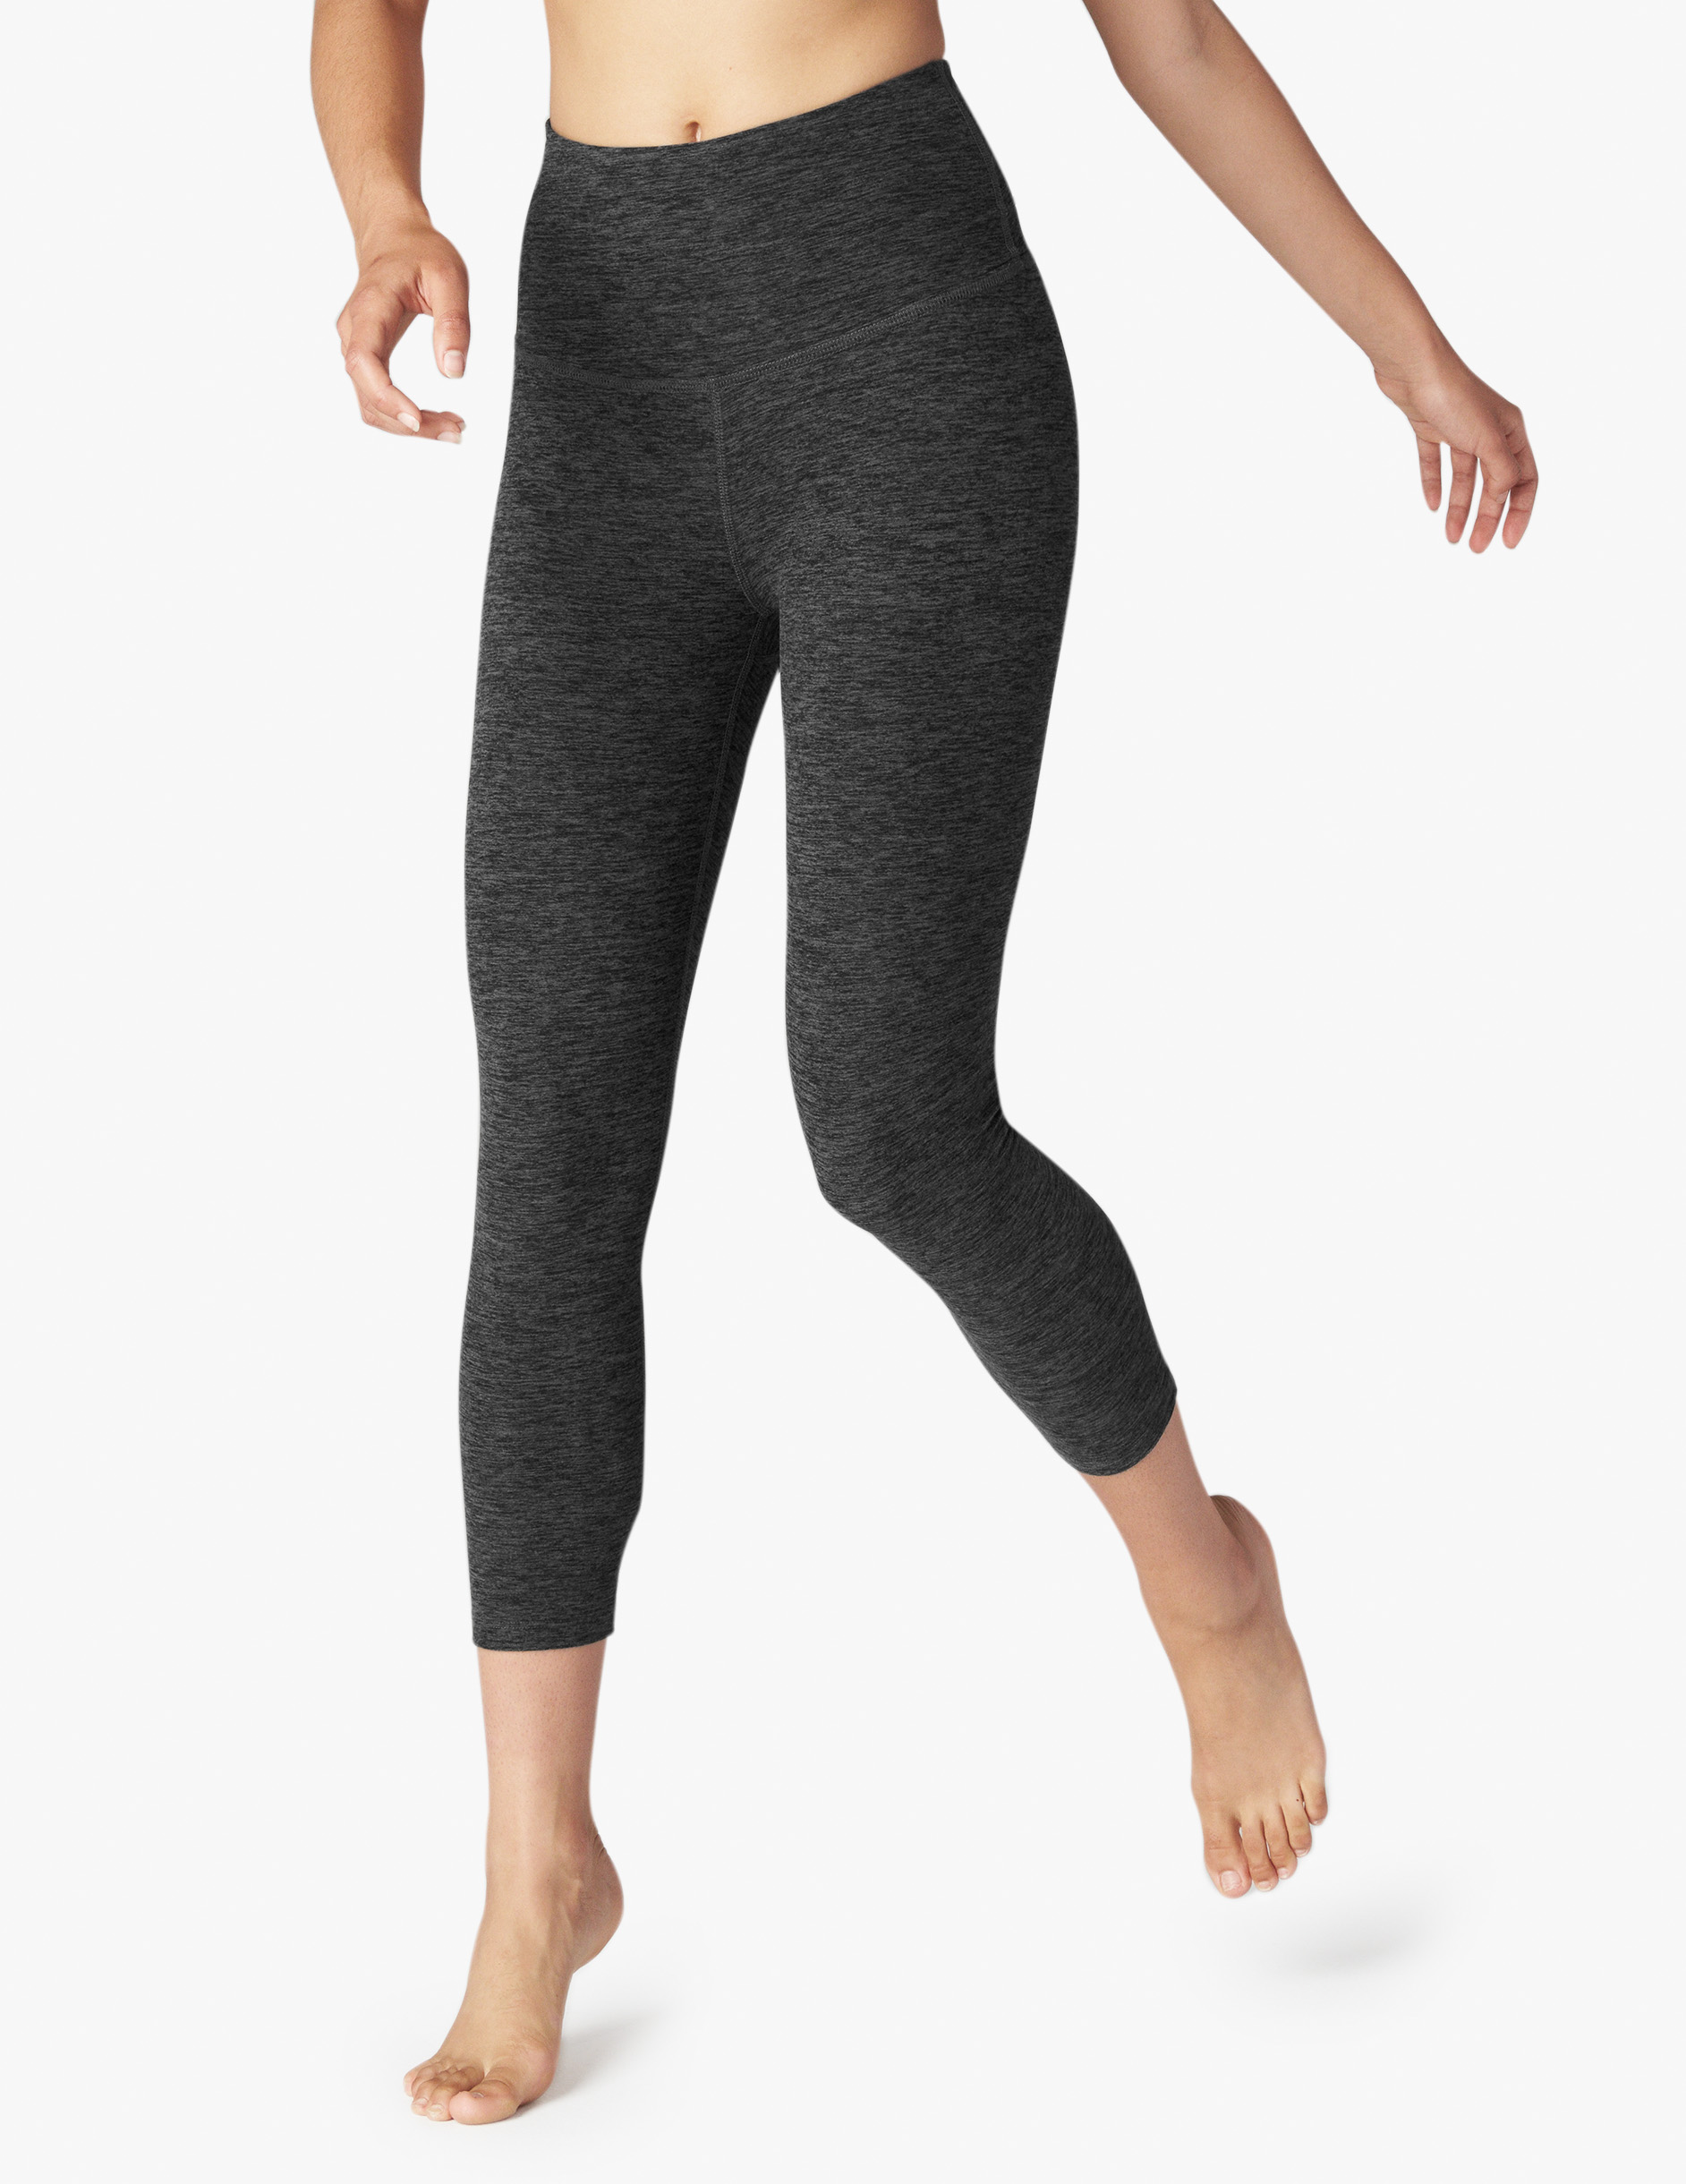 Beyond Yoga High Waist capris black Charcoal